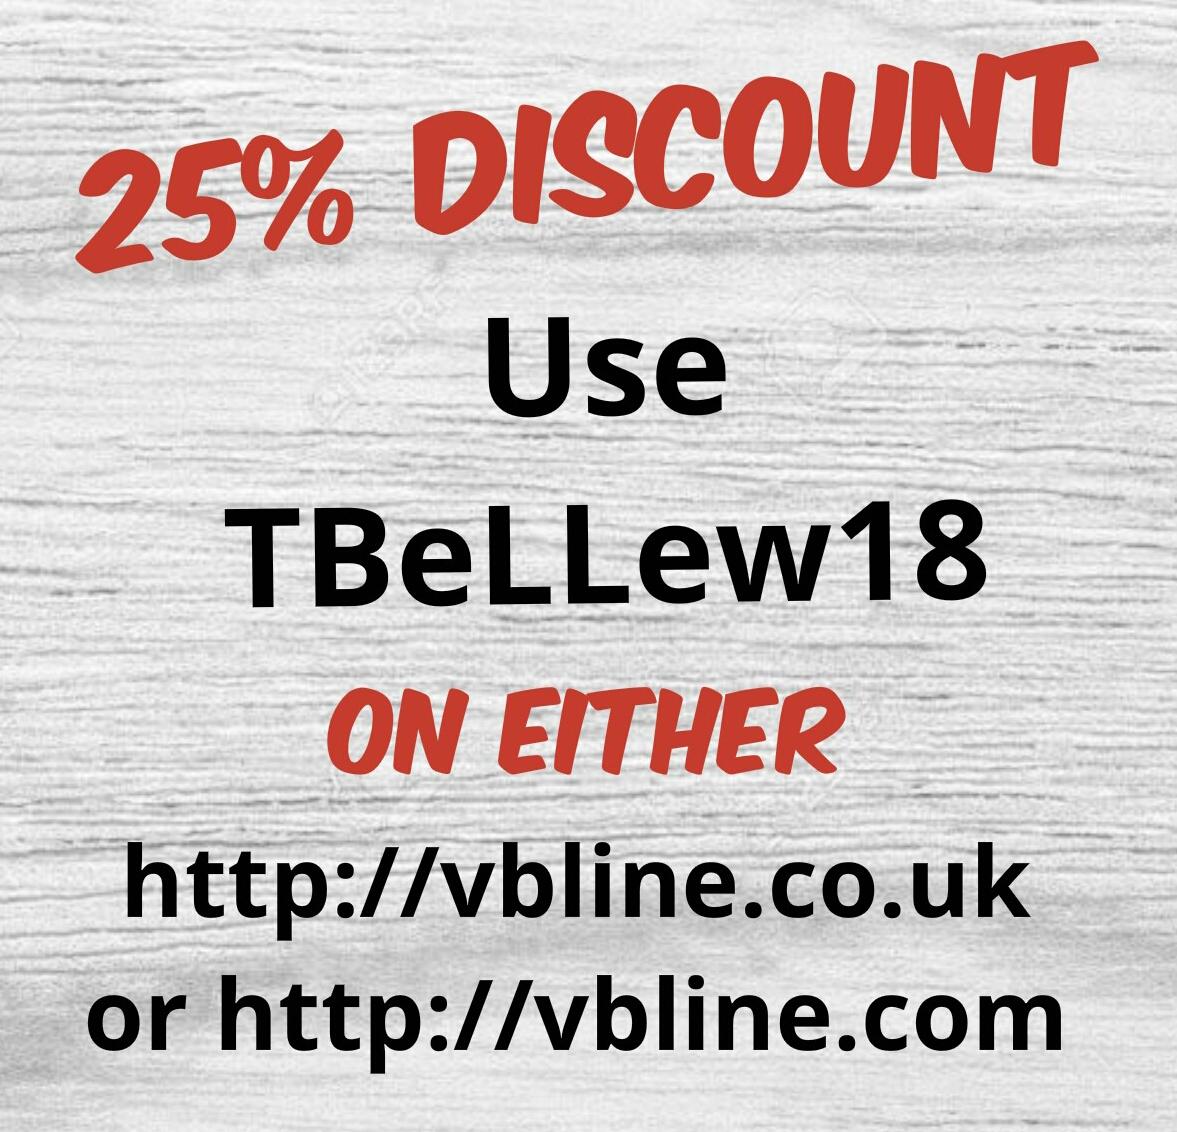 VB Line 25% discount